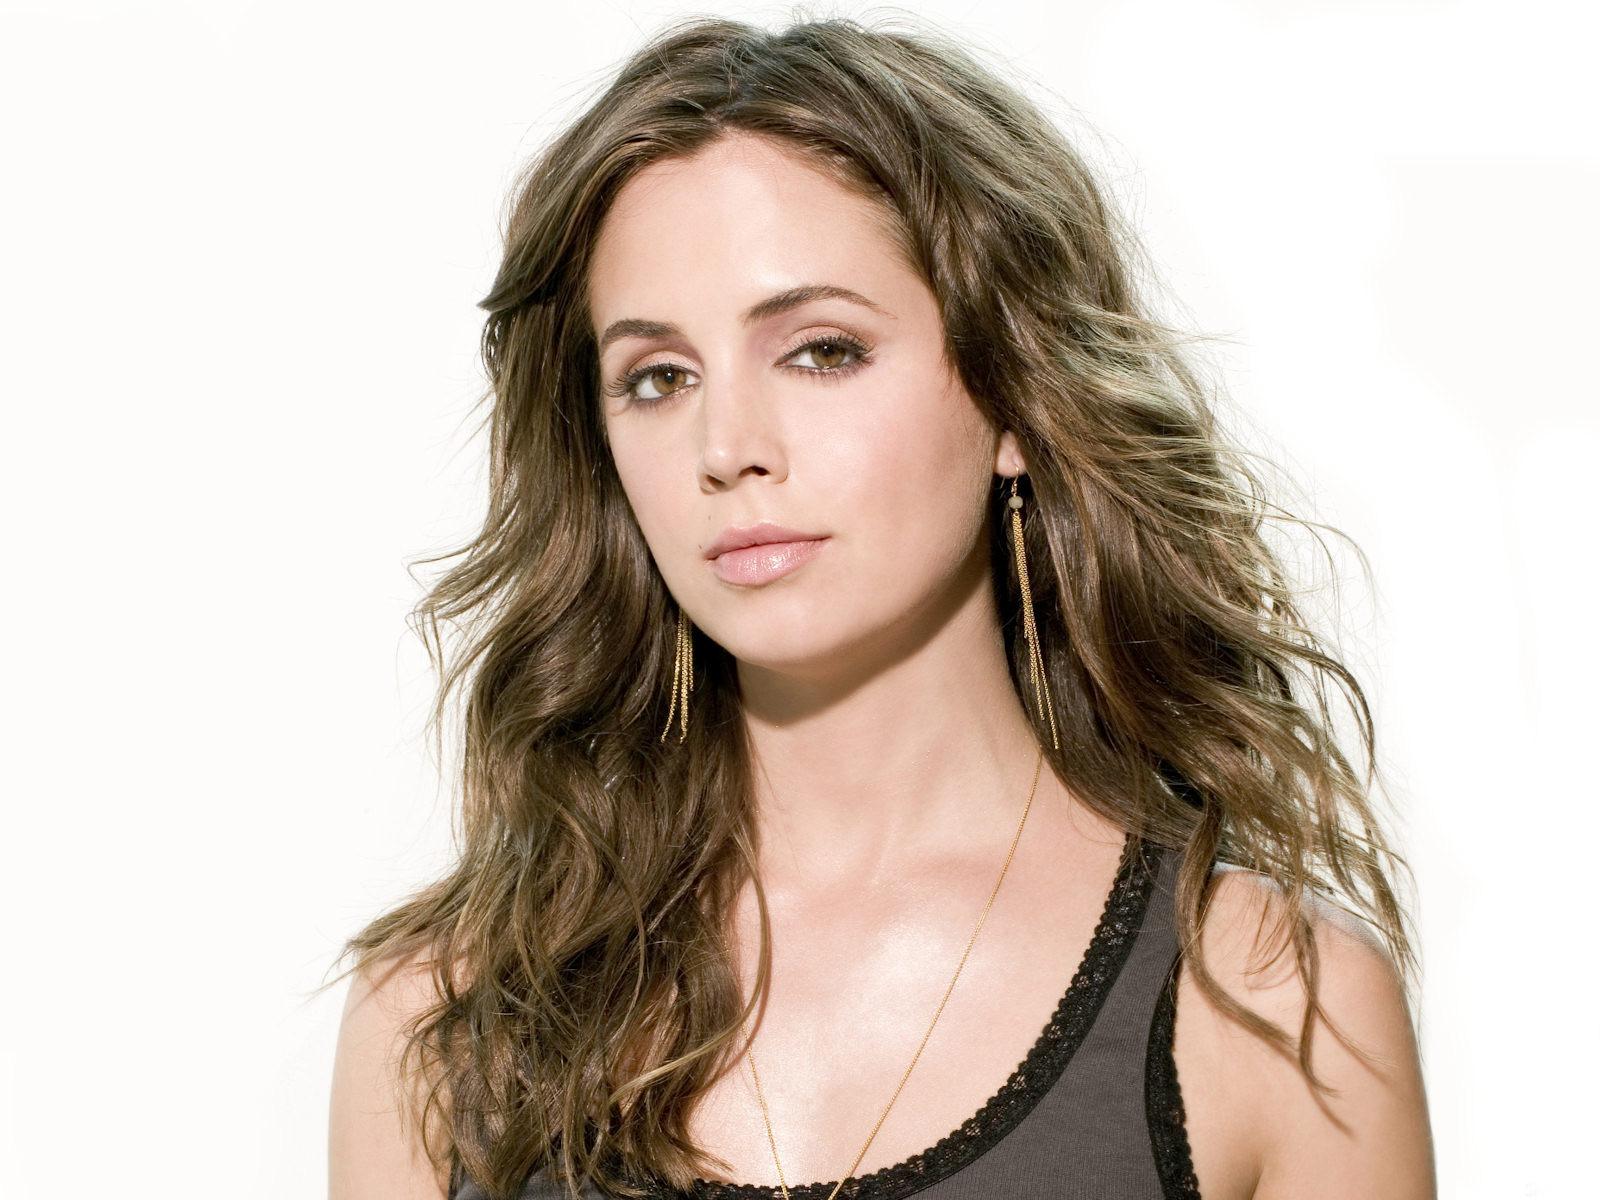 Vampire Diaries Hd Wallpapers 1366x768 Beautiful Eliza Dushku Wallpaper 1600x1200 7045